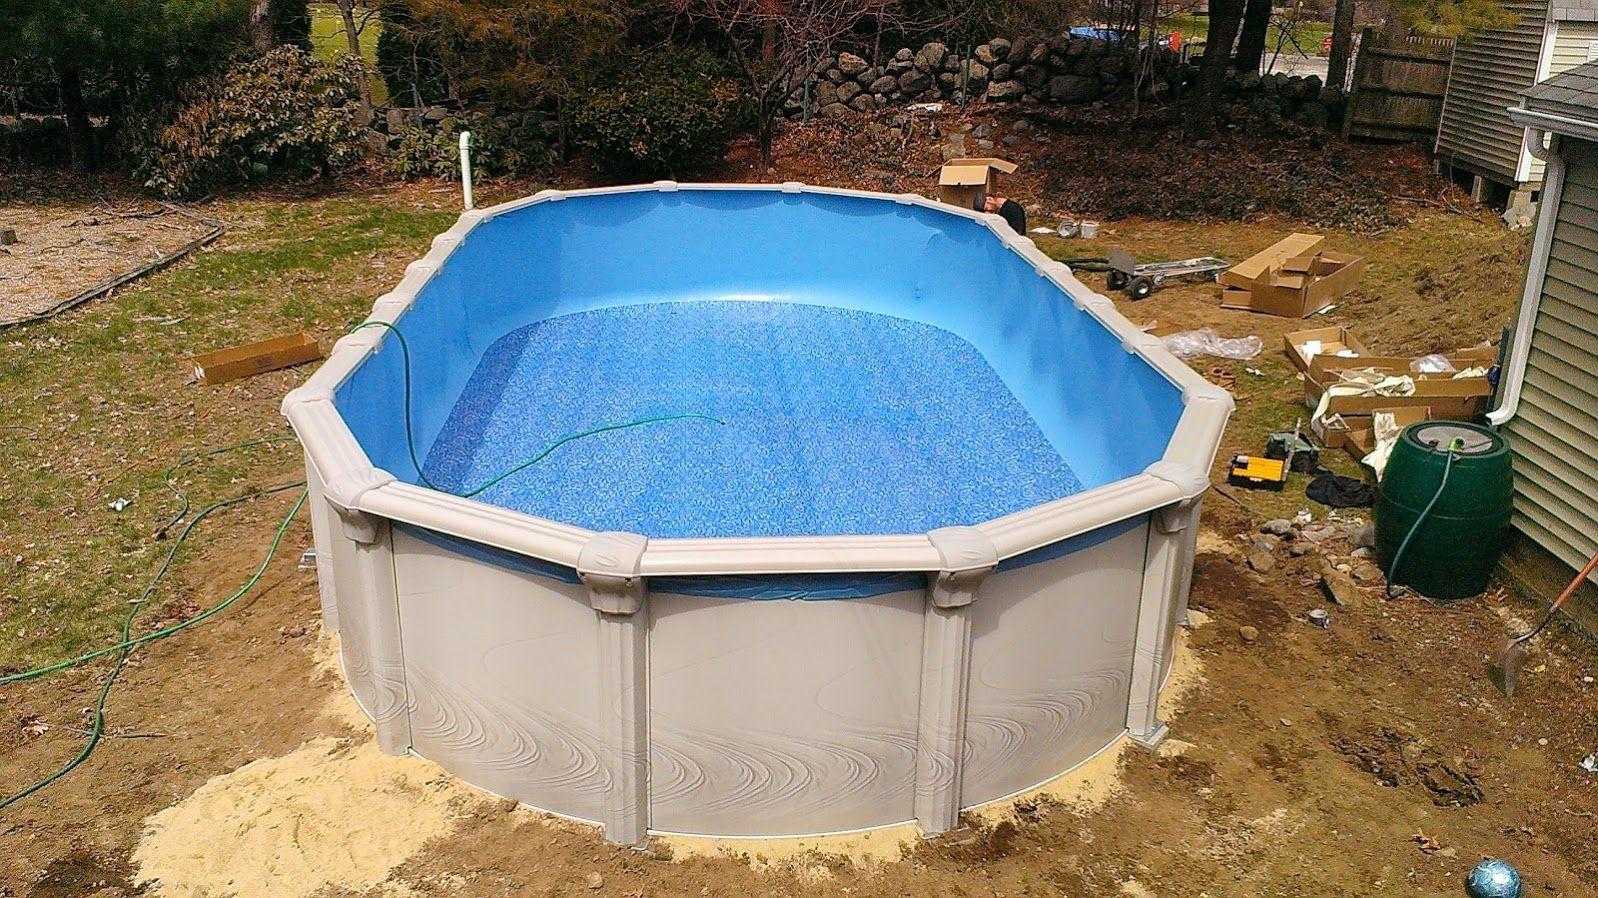 Sharkline Morada Pool Installation In Middleton Ma May 2014